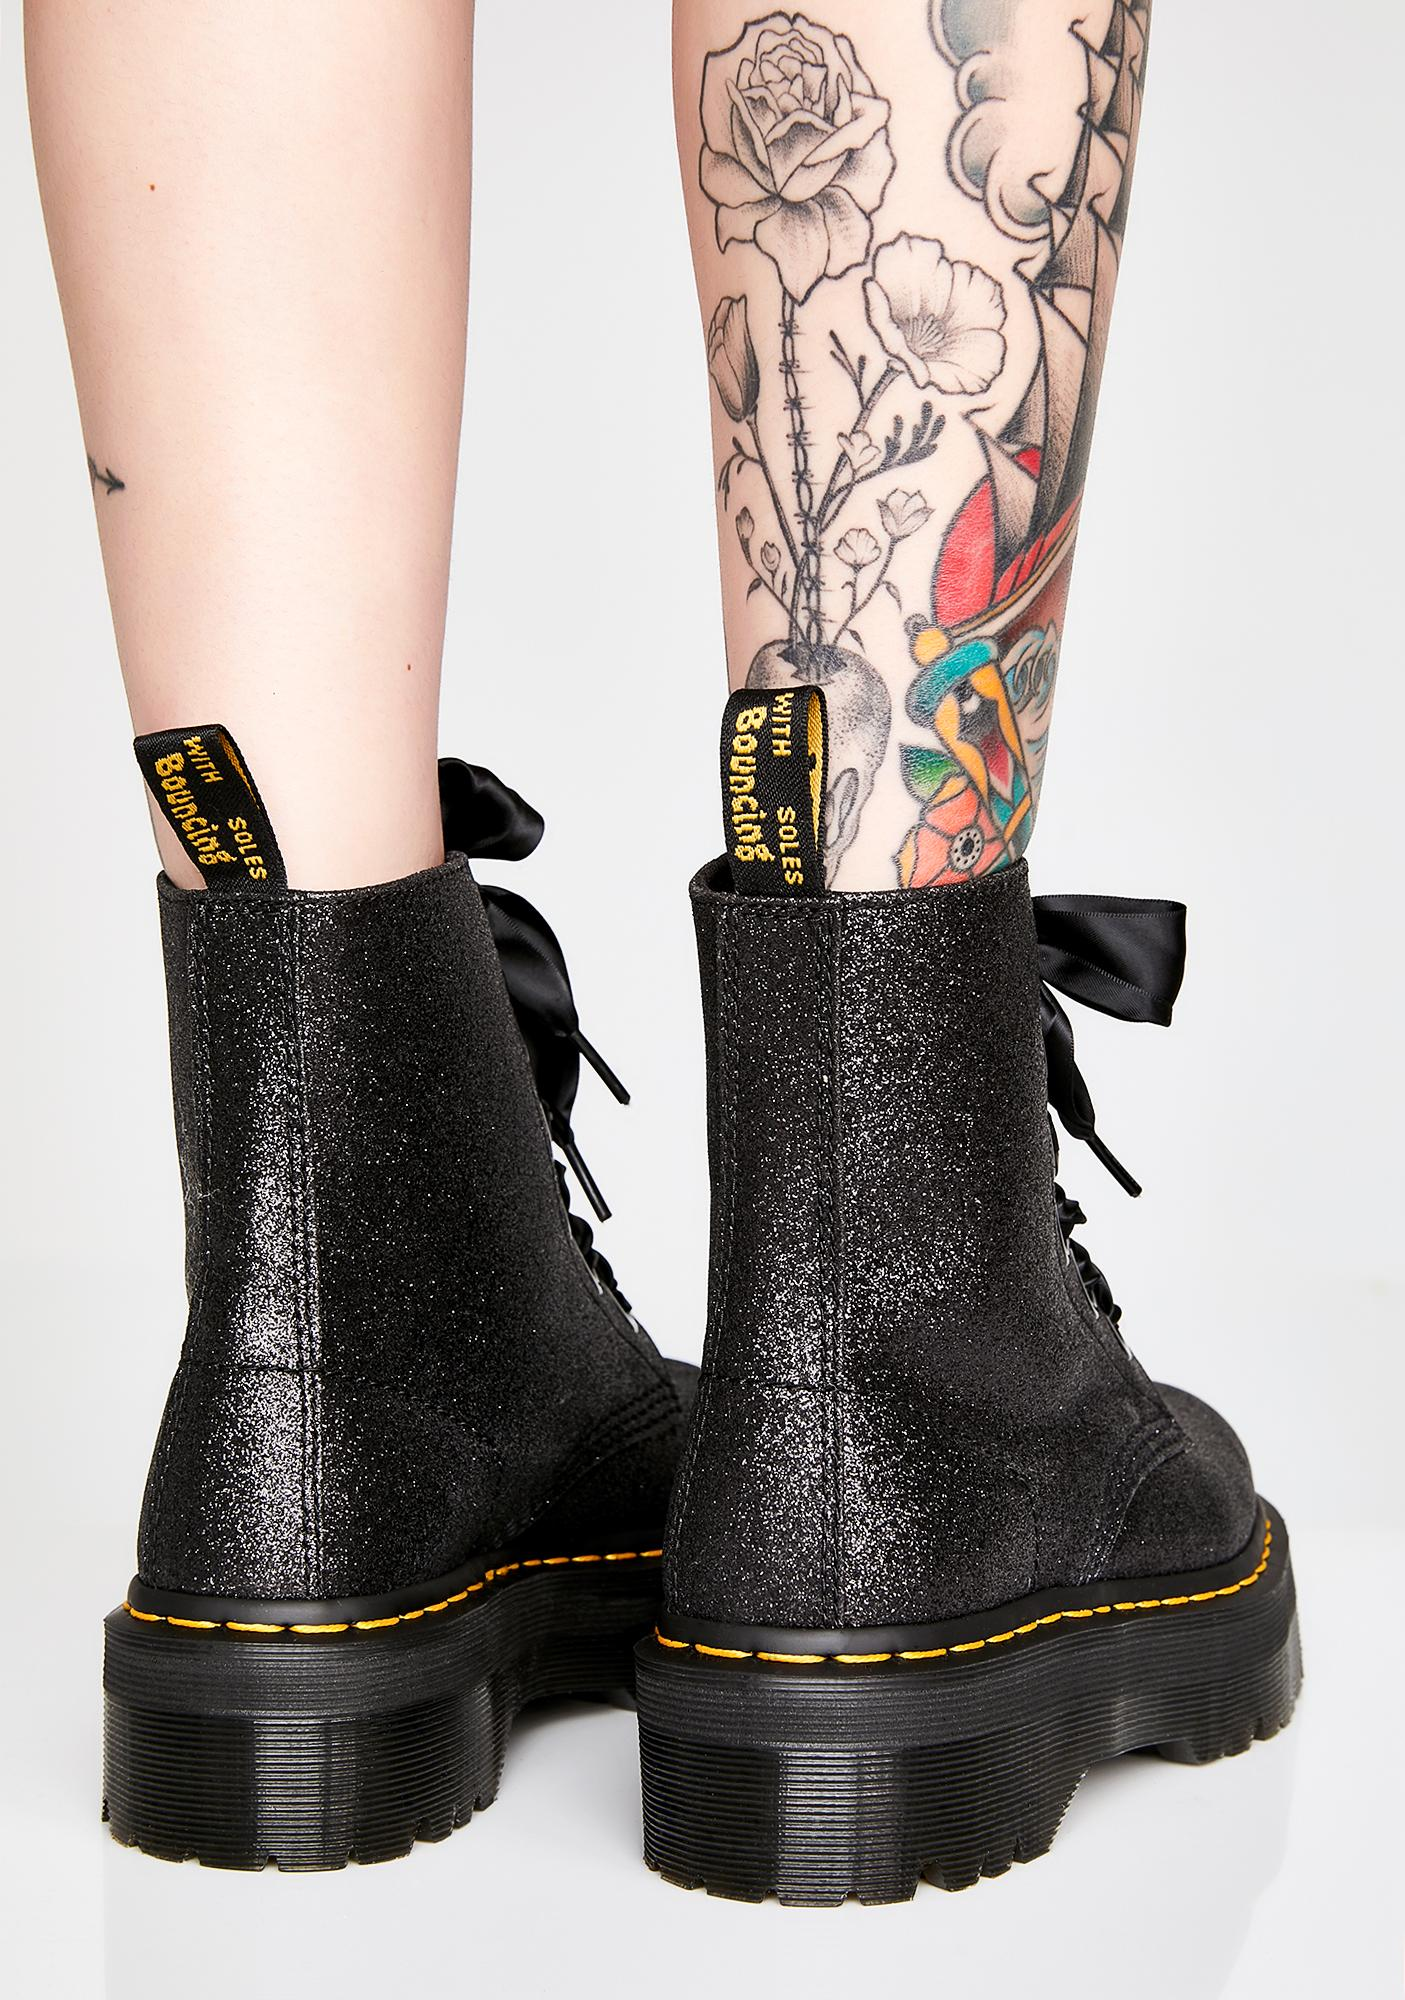 44a0d8e77 Dr. Martens Molly Glitter Boots | Dolls Kill